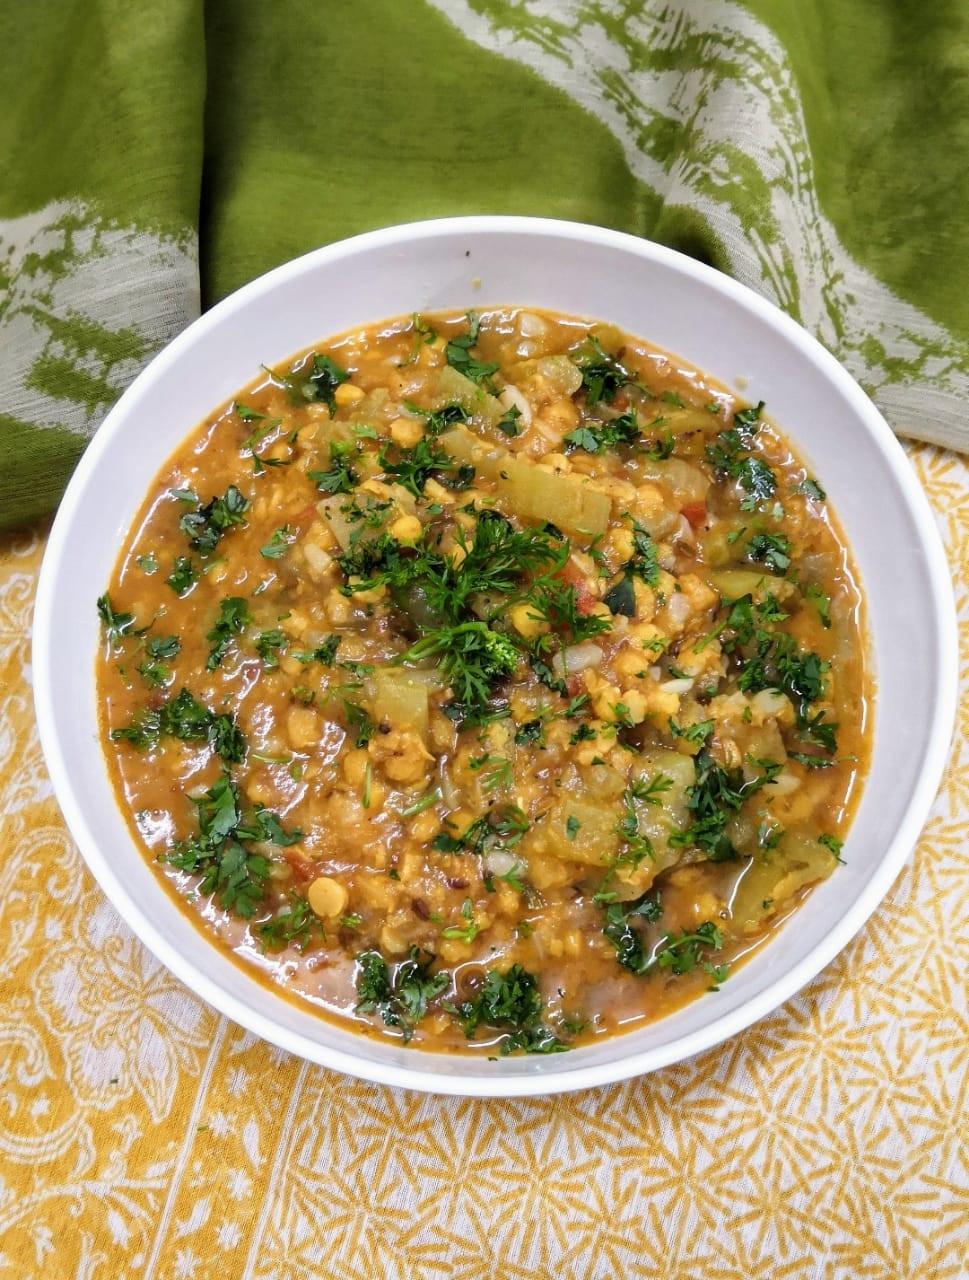 lauki chana dal recipe, ghiya chane ki dal, bottle gourd split chickpeas curry, traditional indian food recipes, indian dinner ideas, one pot meals indian, authentic indian food recipe blog whiskmixstir, sheetal jandial